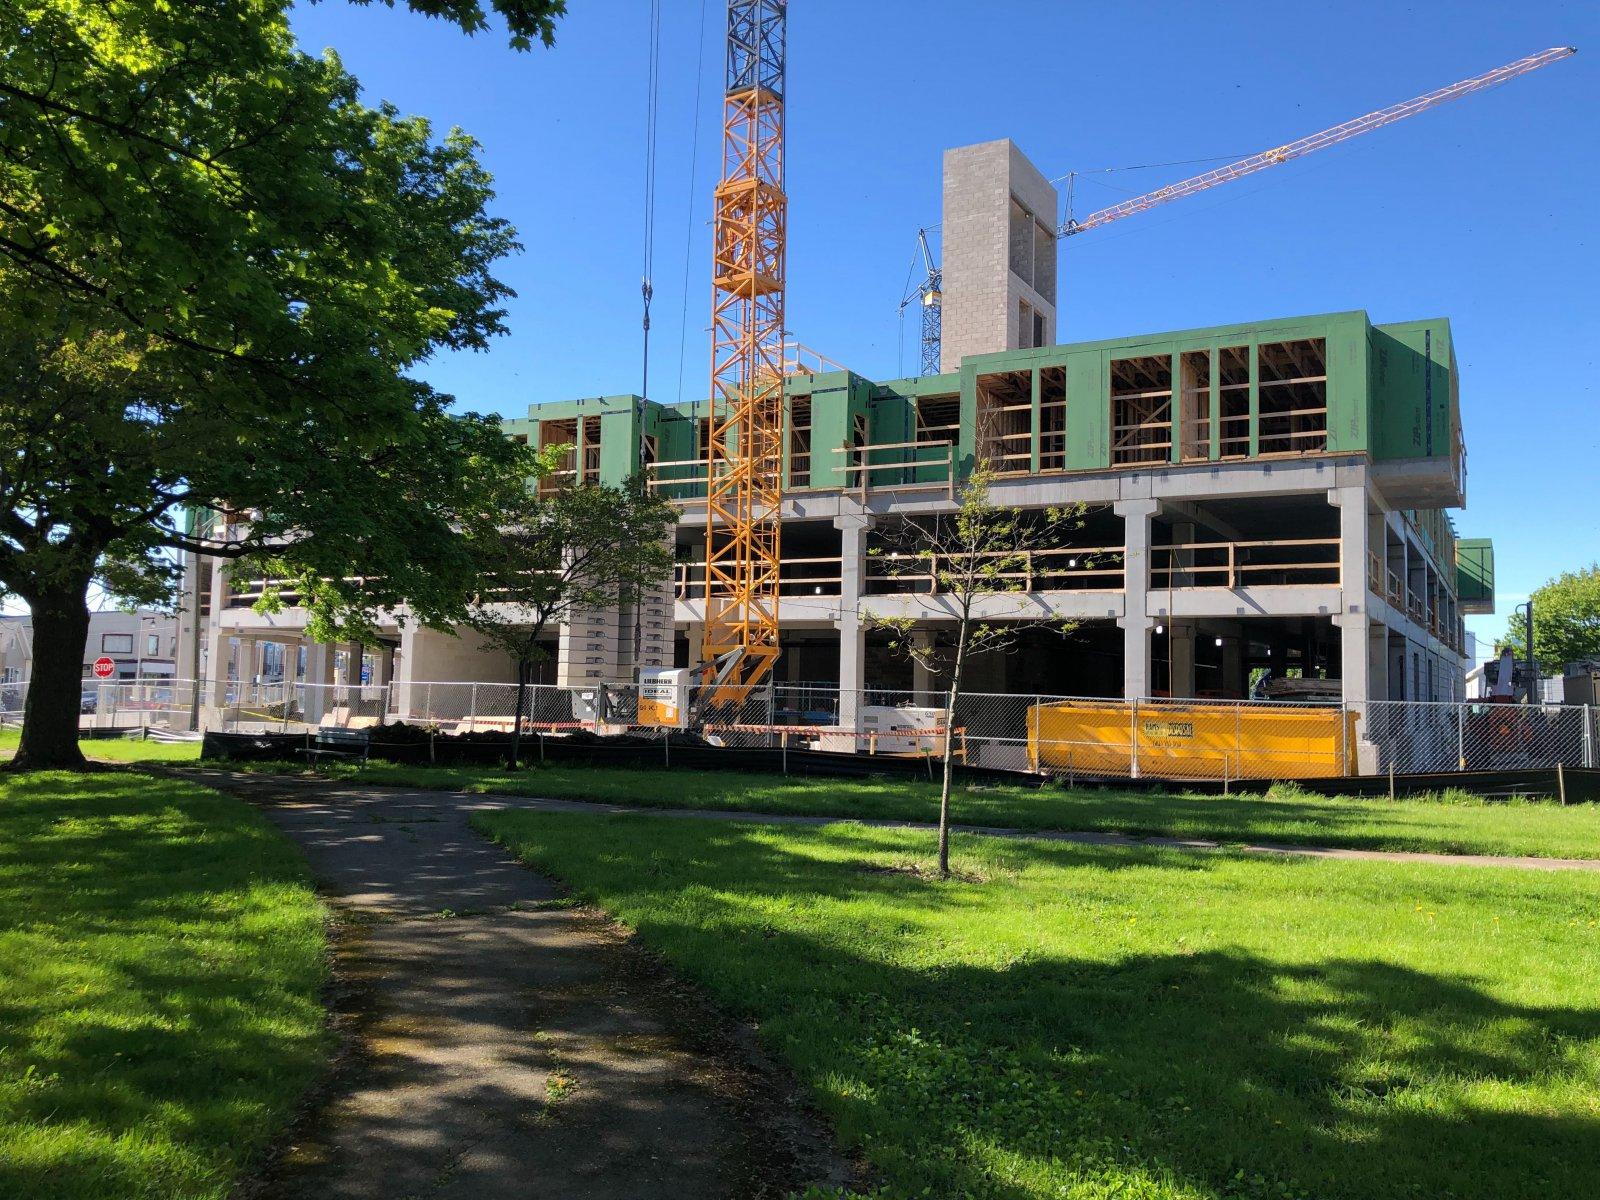 KinetiK Construction